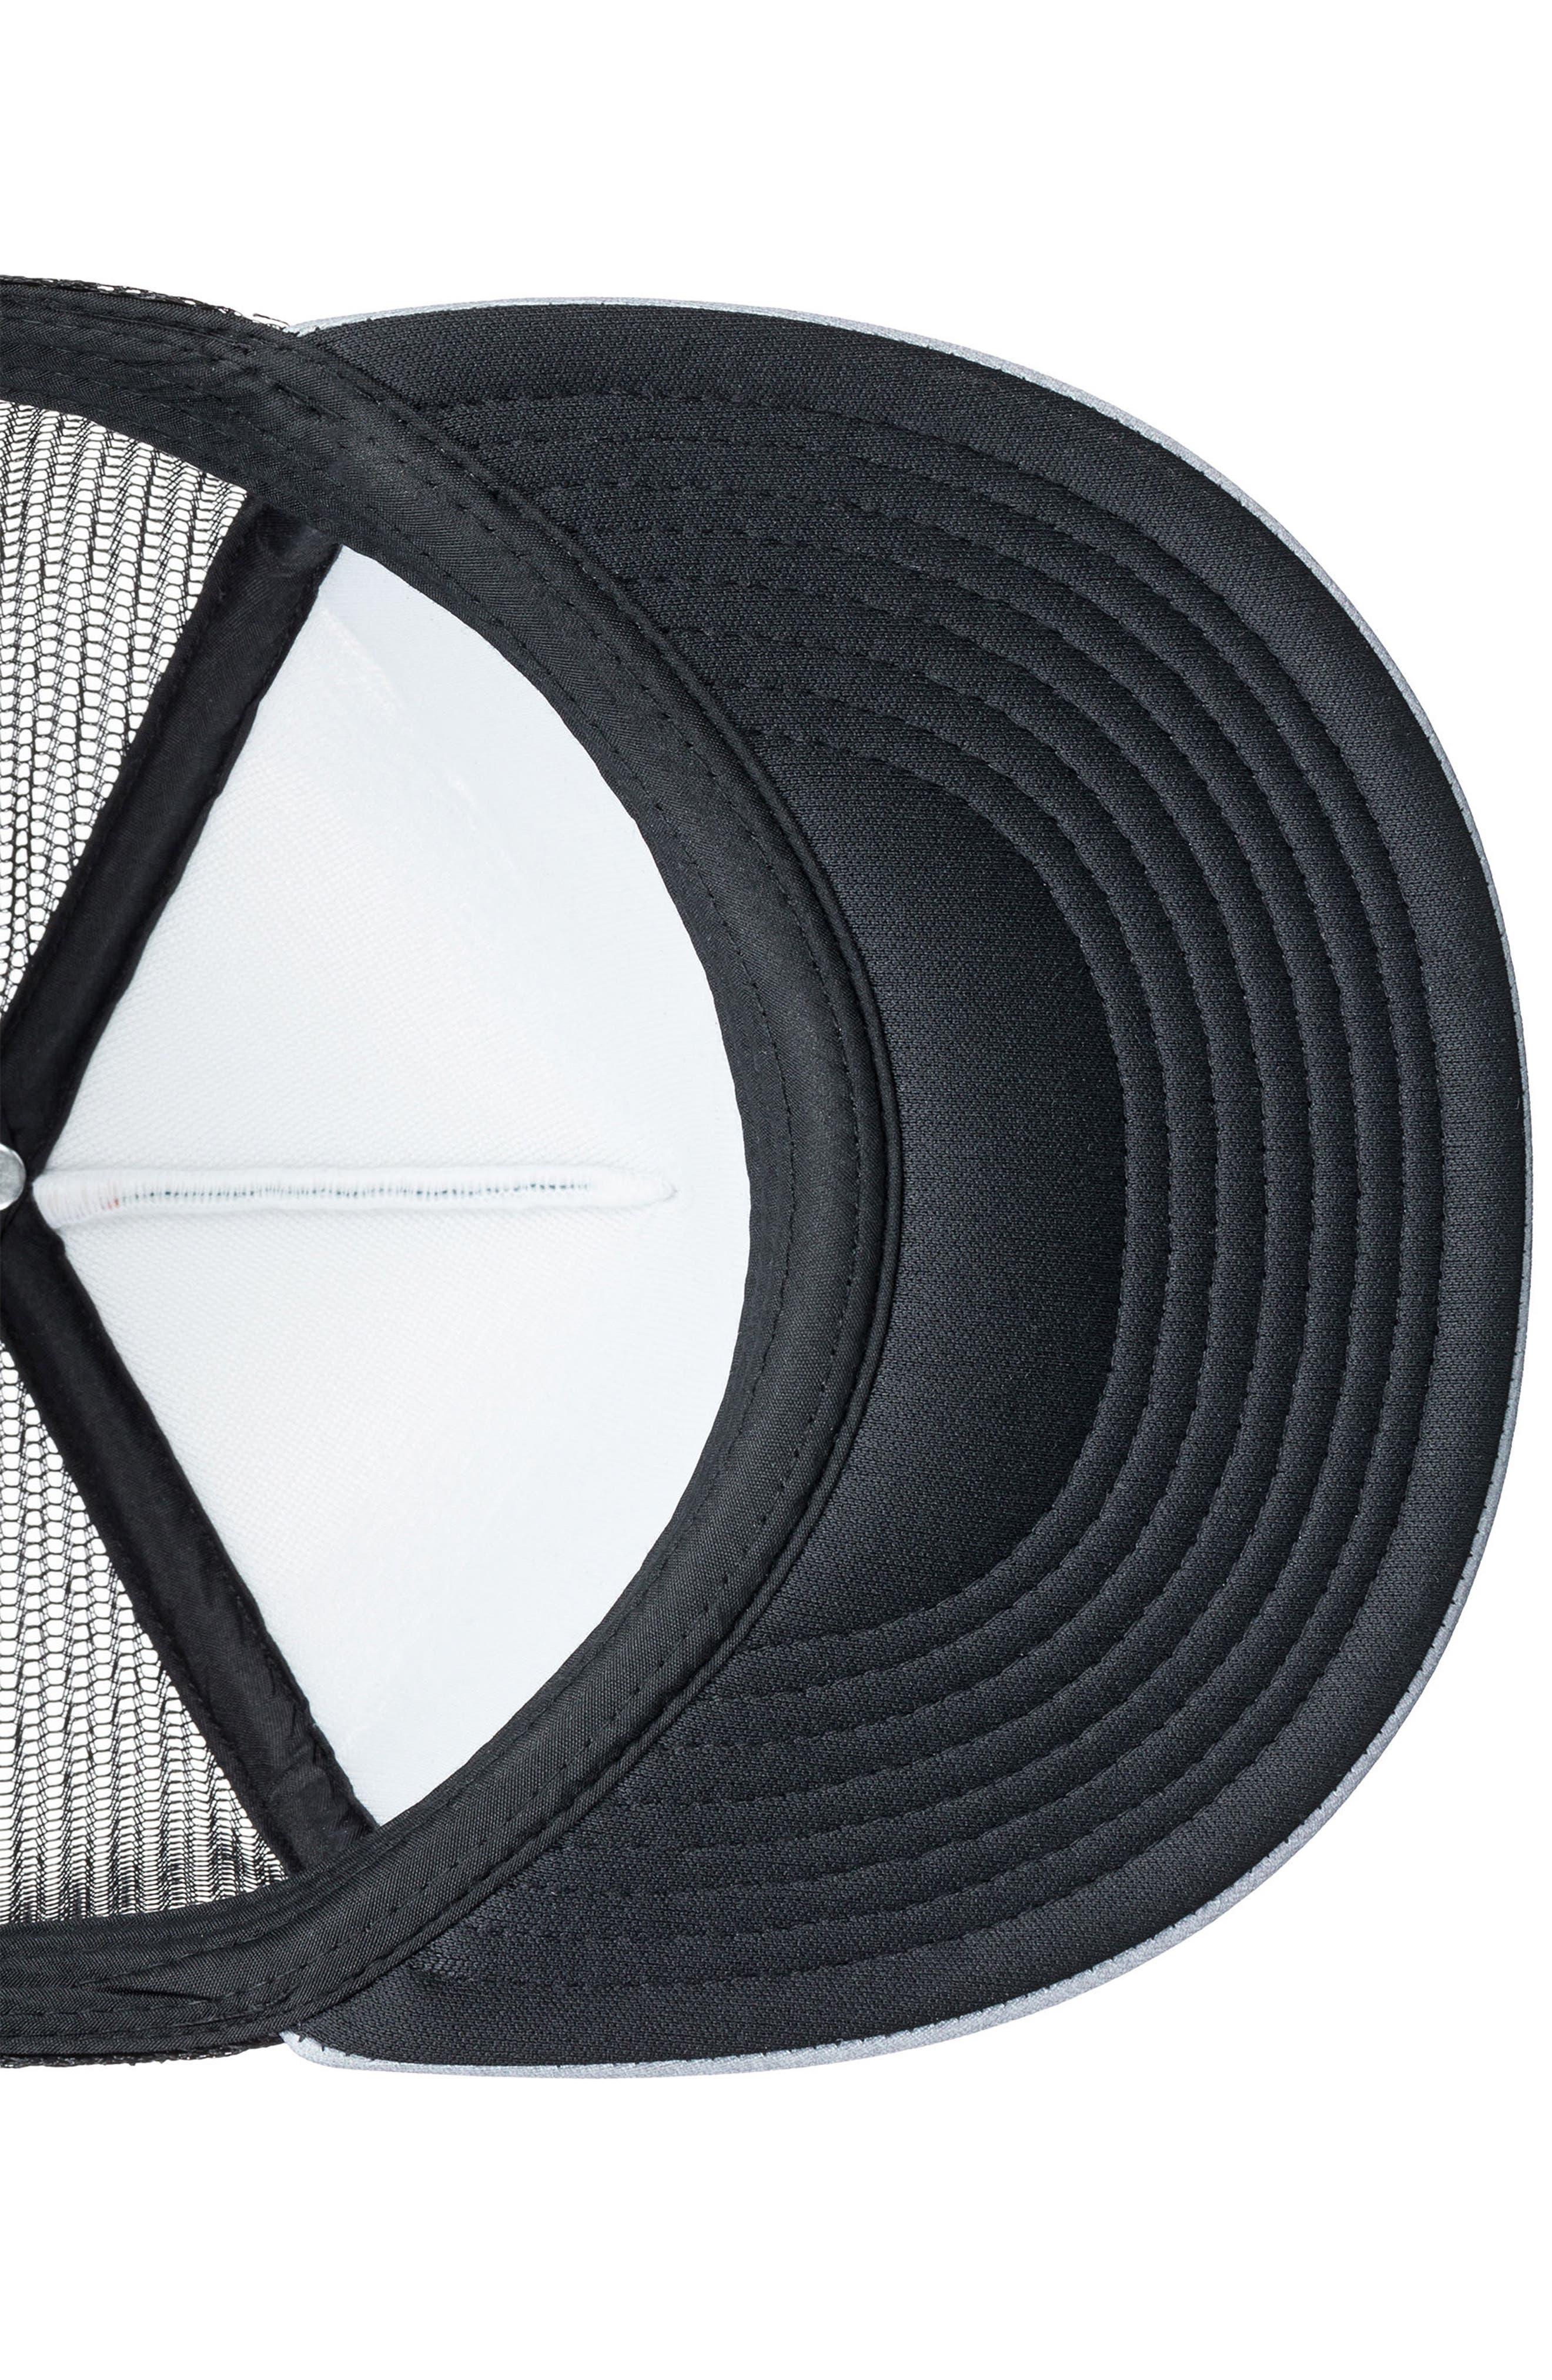 Vixten Trucker Hat,                             Alternate thumbnail 3, color,                             022